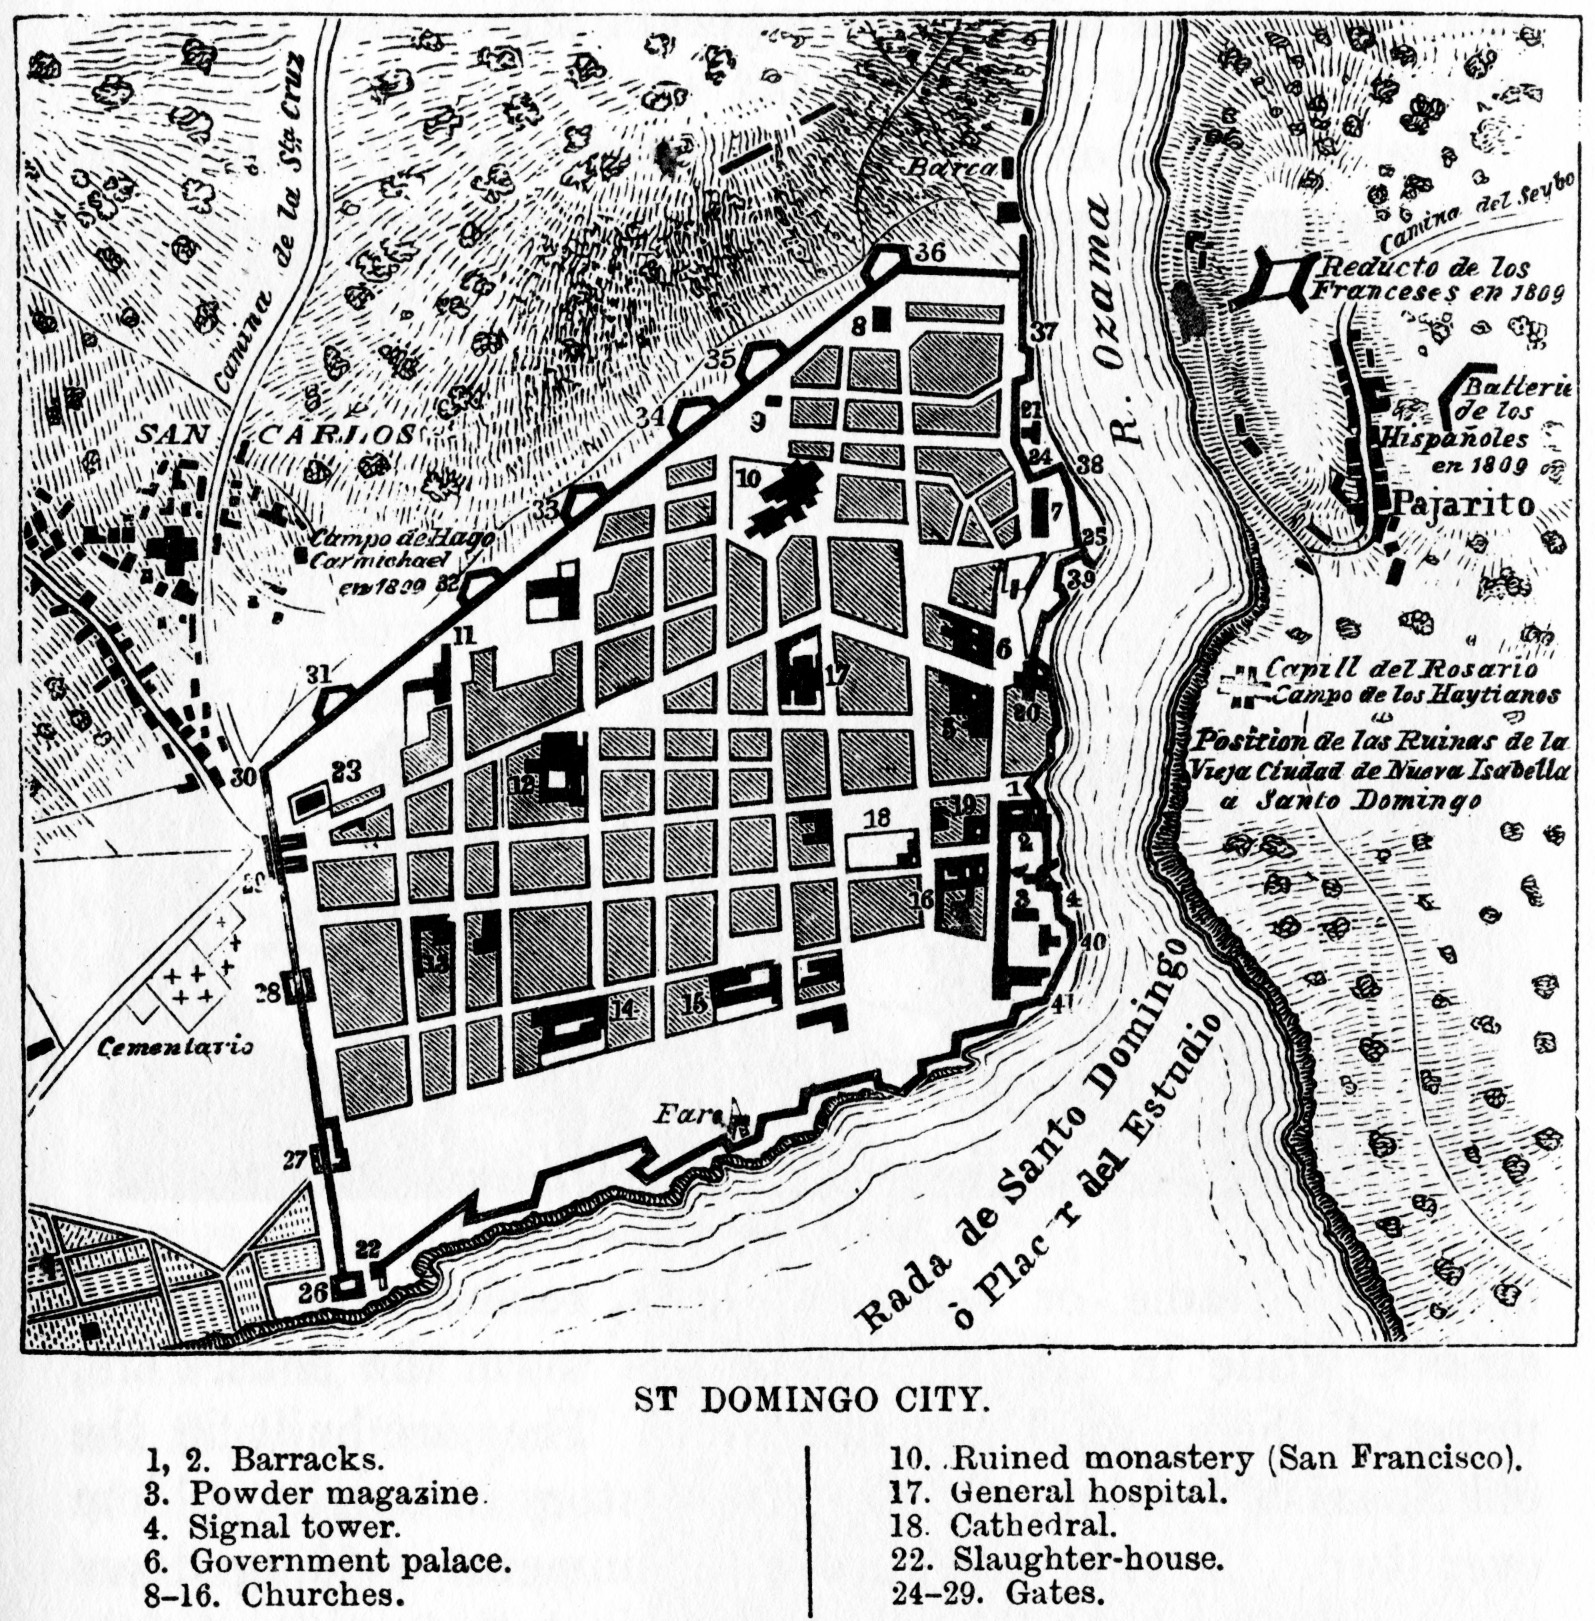 FileSanto Domingo Map Jpg Wikimedia Commons - Santo domingo map